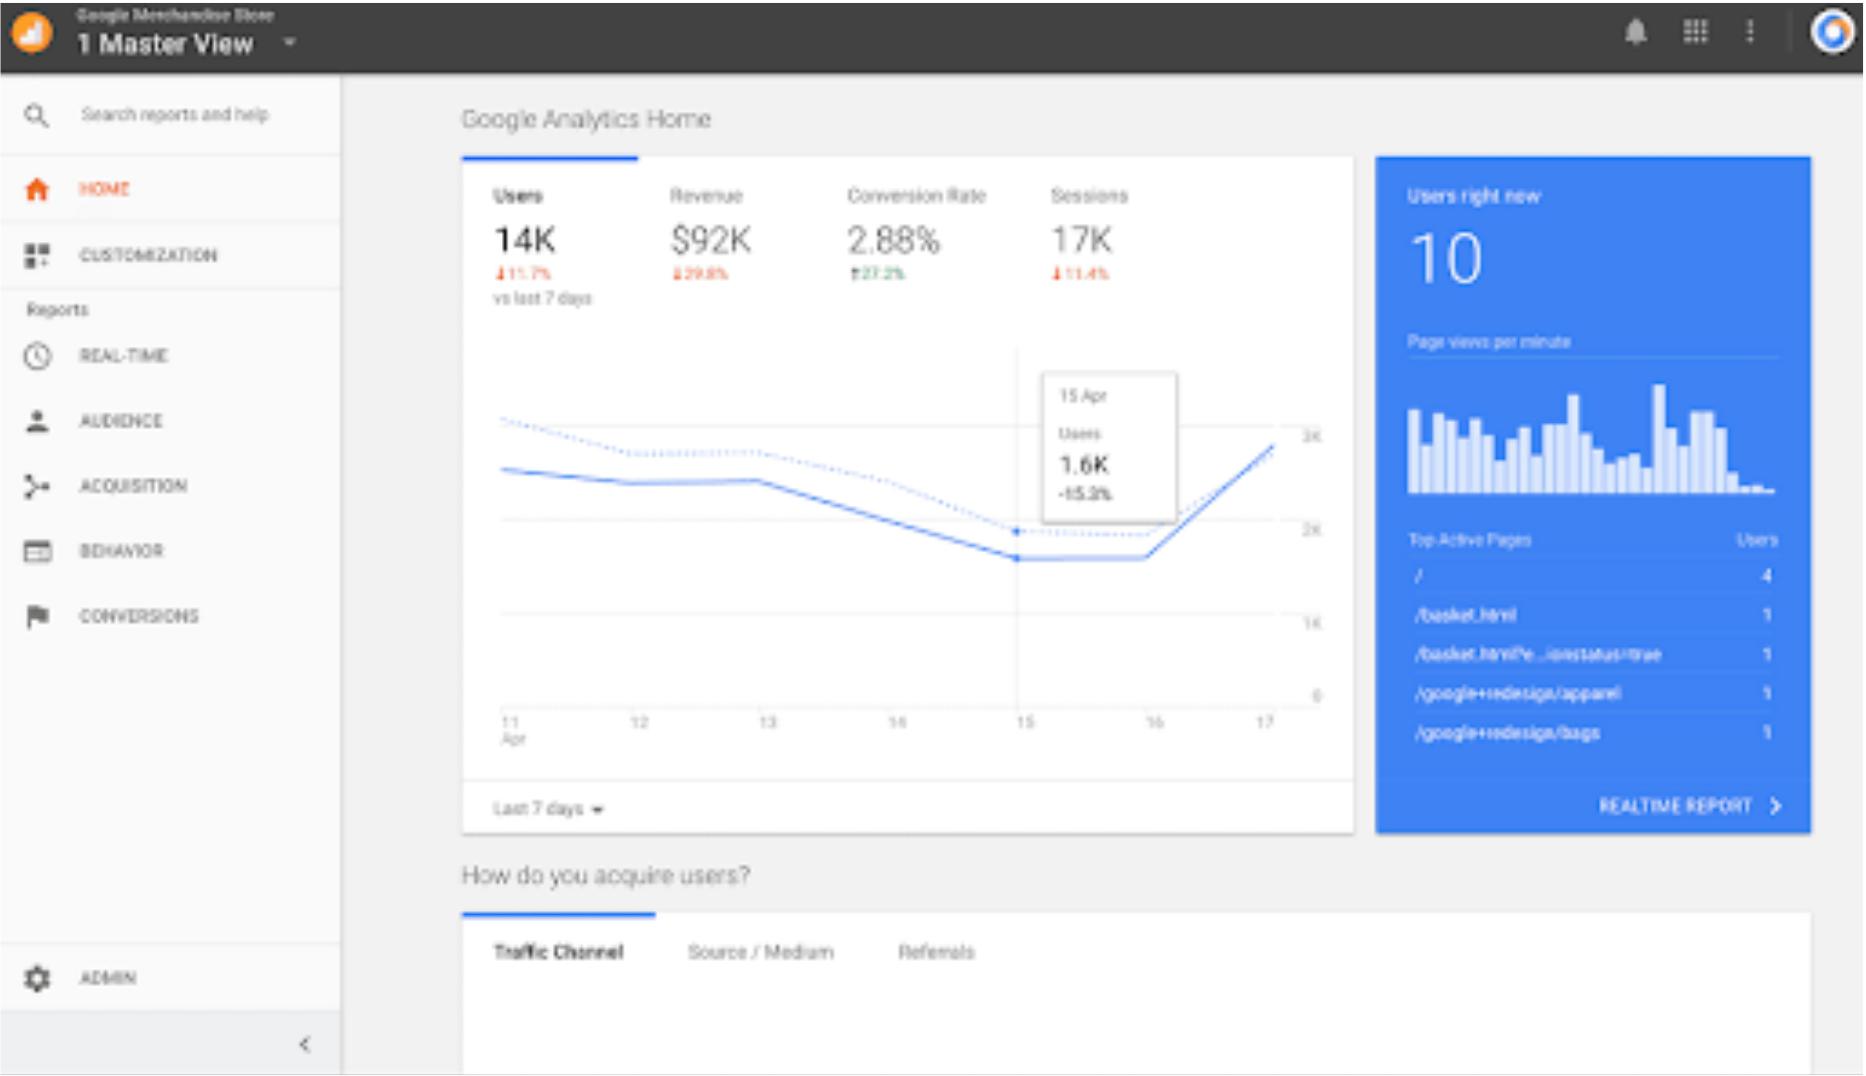 Google Analytics: Measure Inbound Performance - 11 Best Inbound Marketing Tools to Boost Your Business in 2021